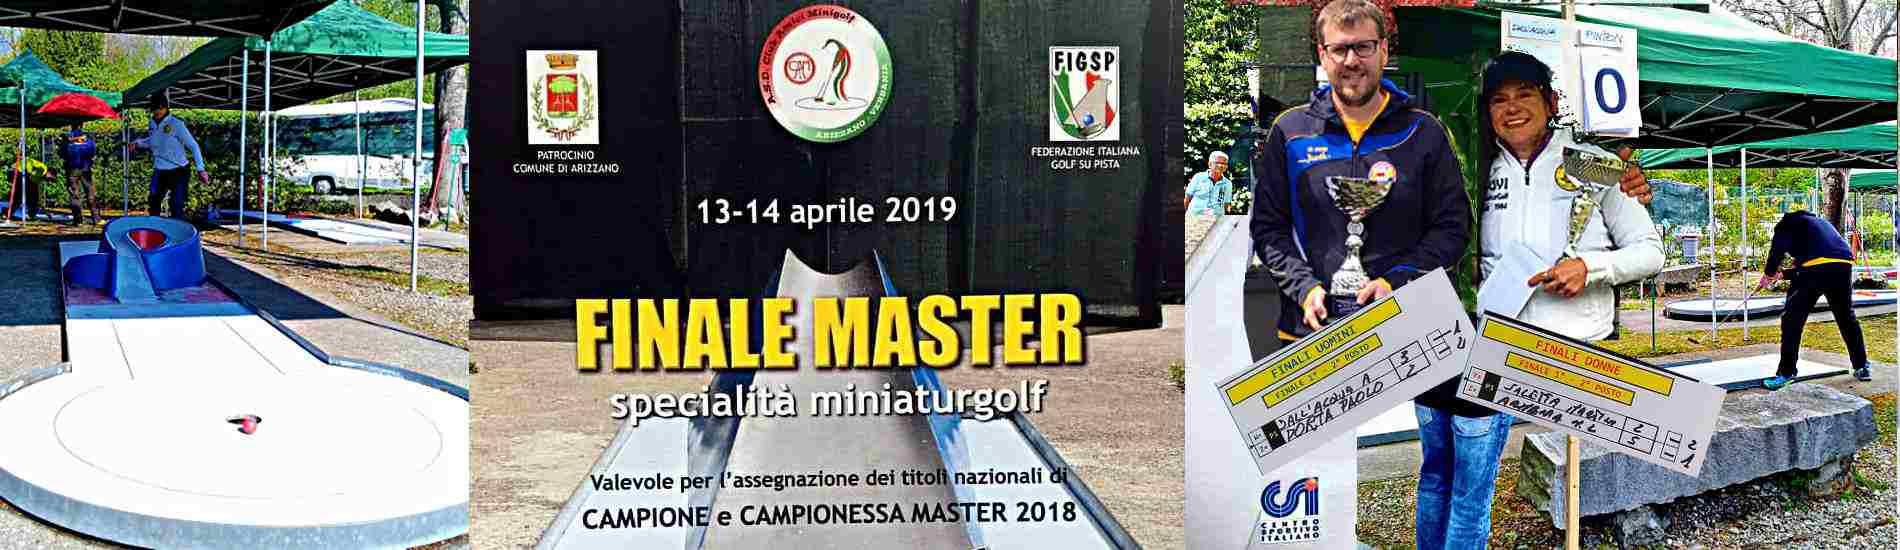 I Campioni Master 2018